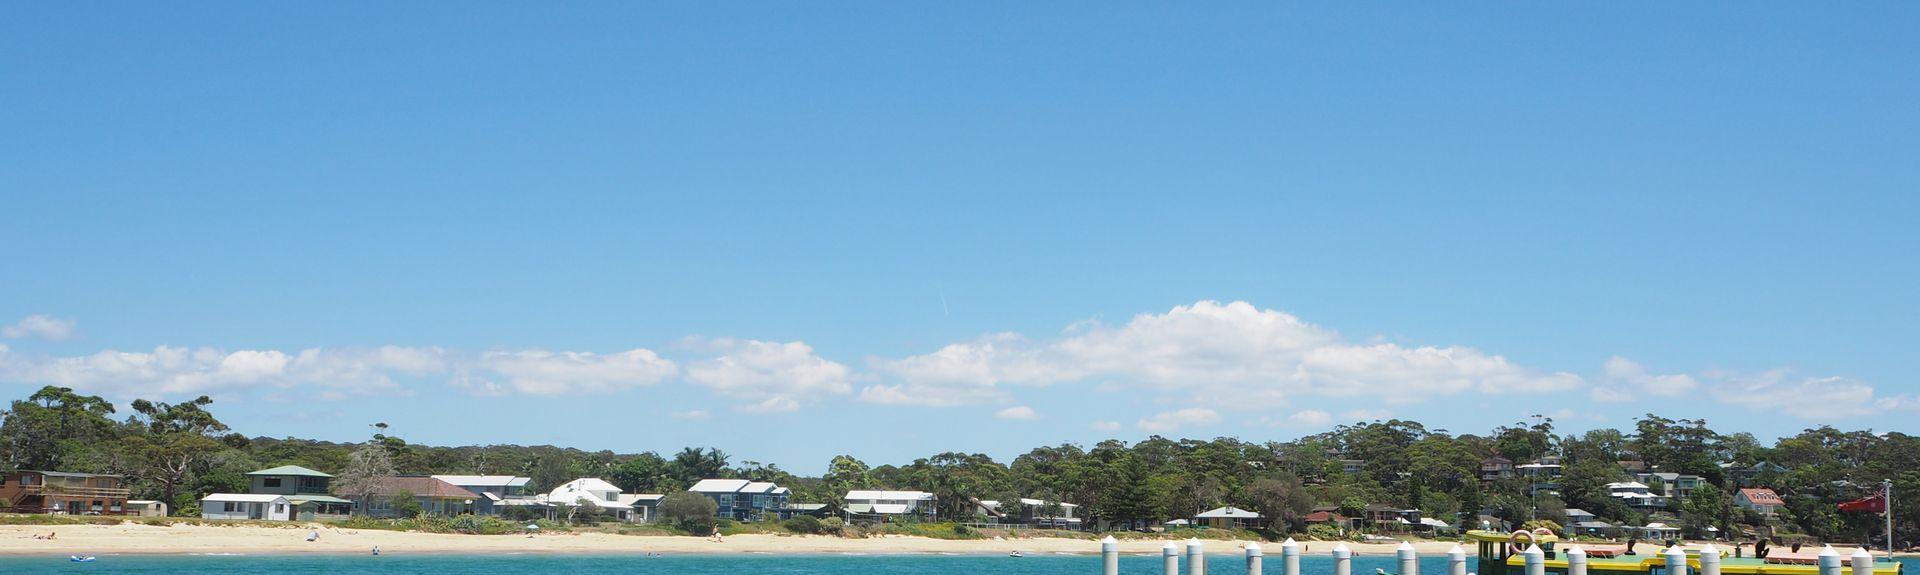 Bundeena NSW, Australia